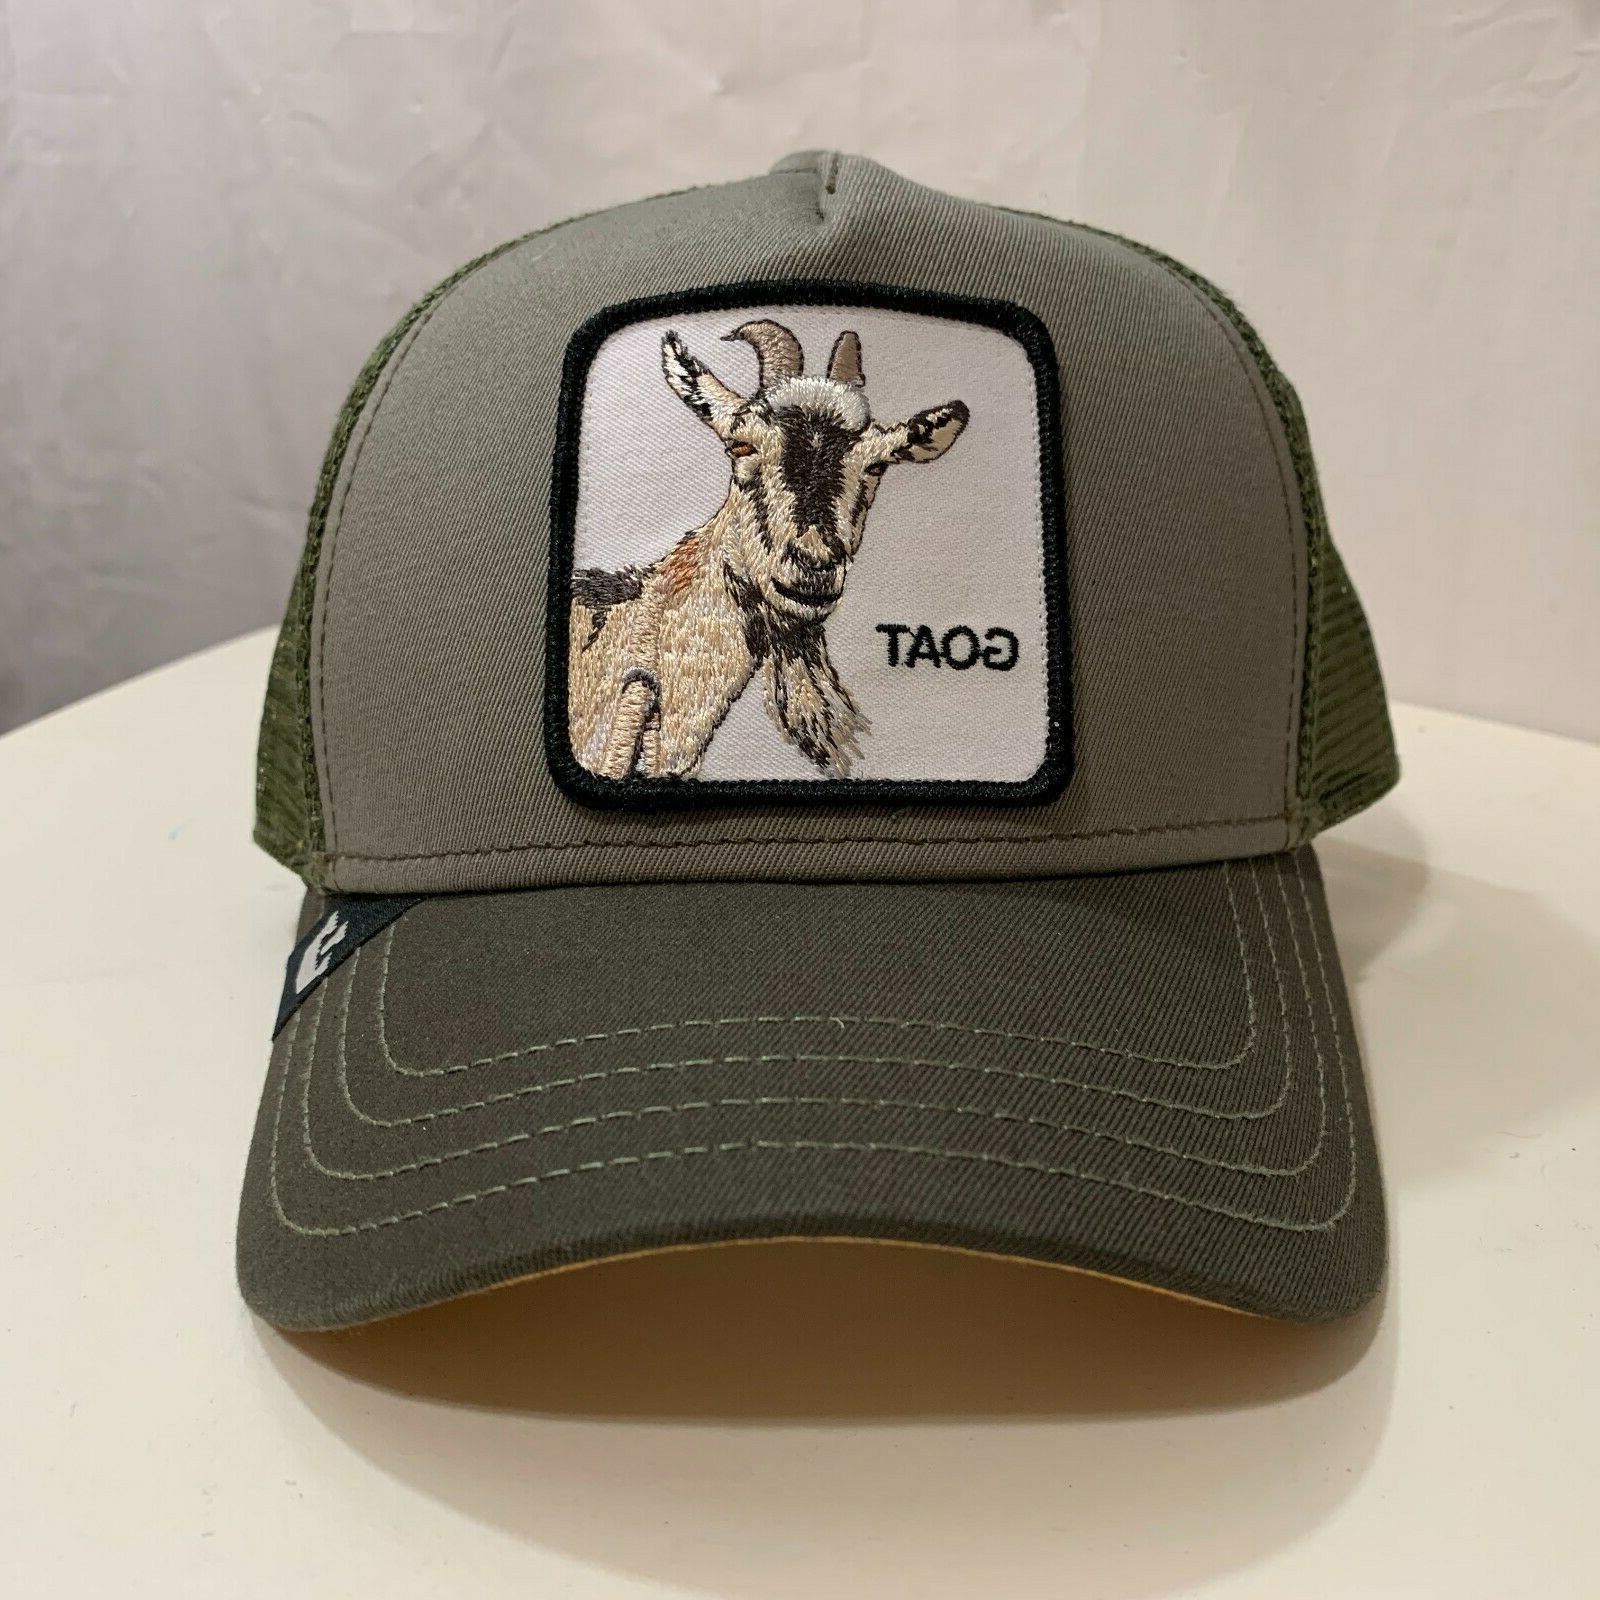 Goorin Bros Mens Authentic Originals Trucker Hats